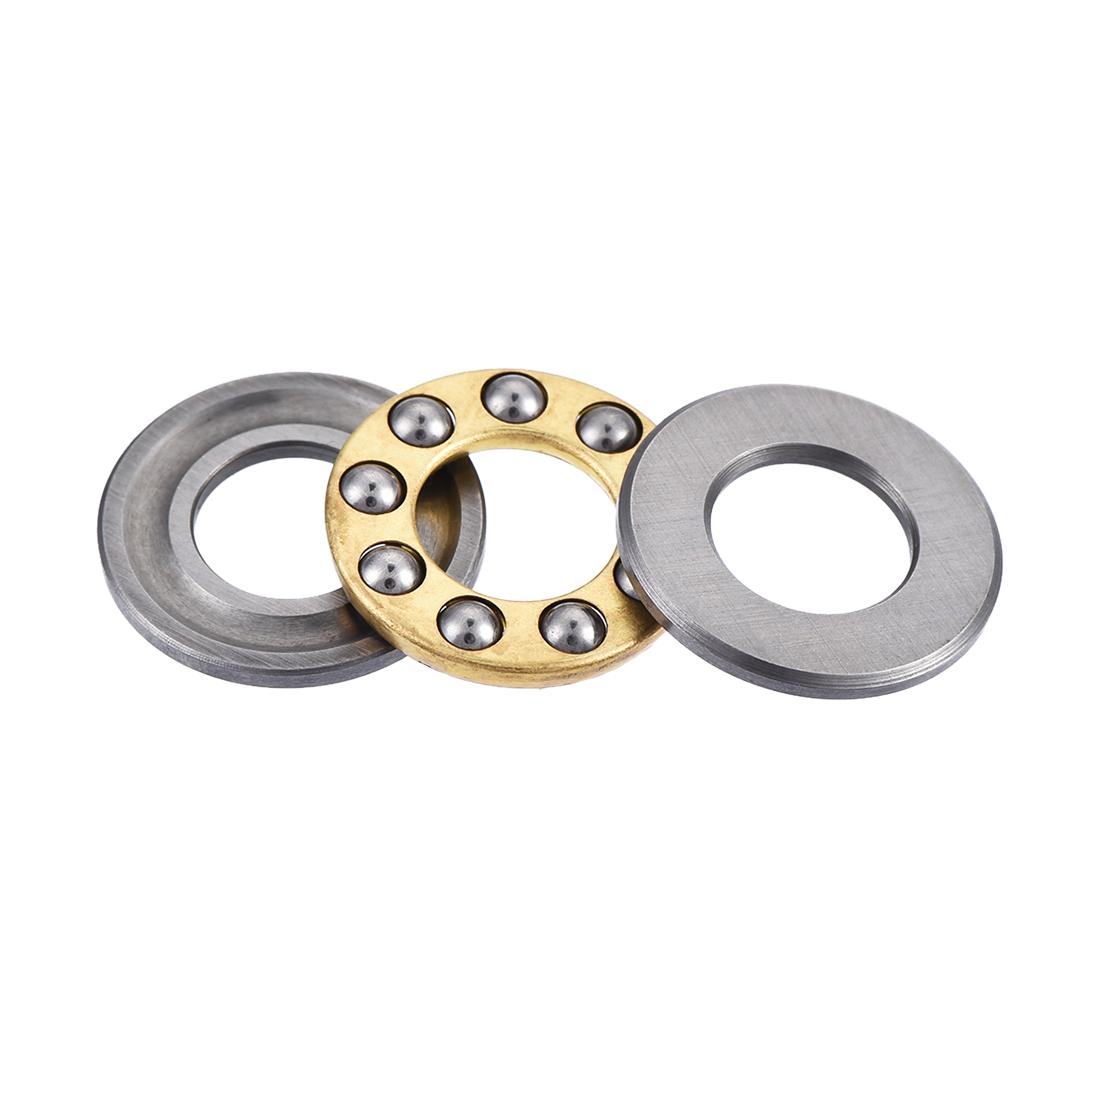 16mm-x-8mm-x-5mm-F8-16-Single-Direction-Axial-Thrust-Ball-Roller-Bearing